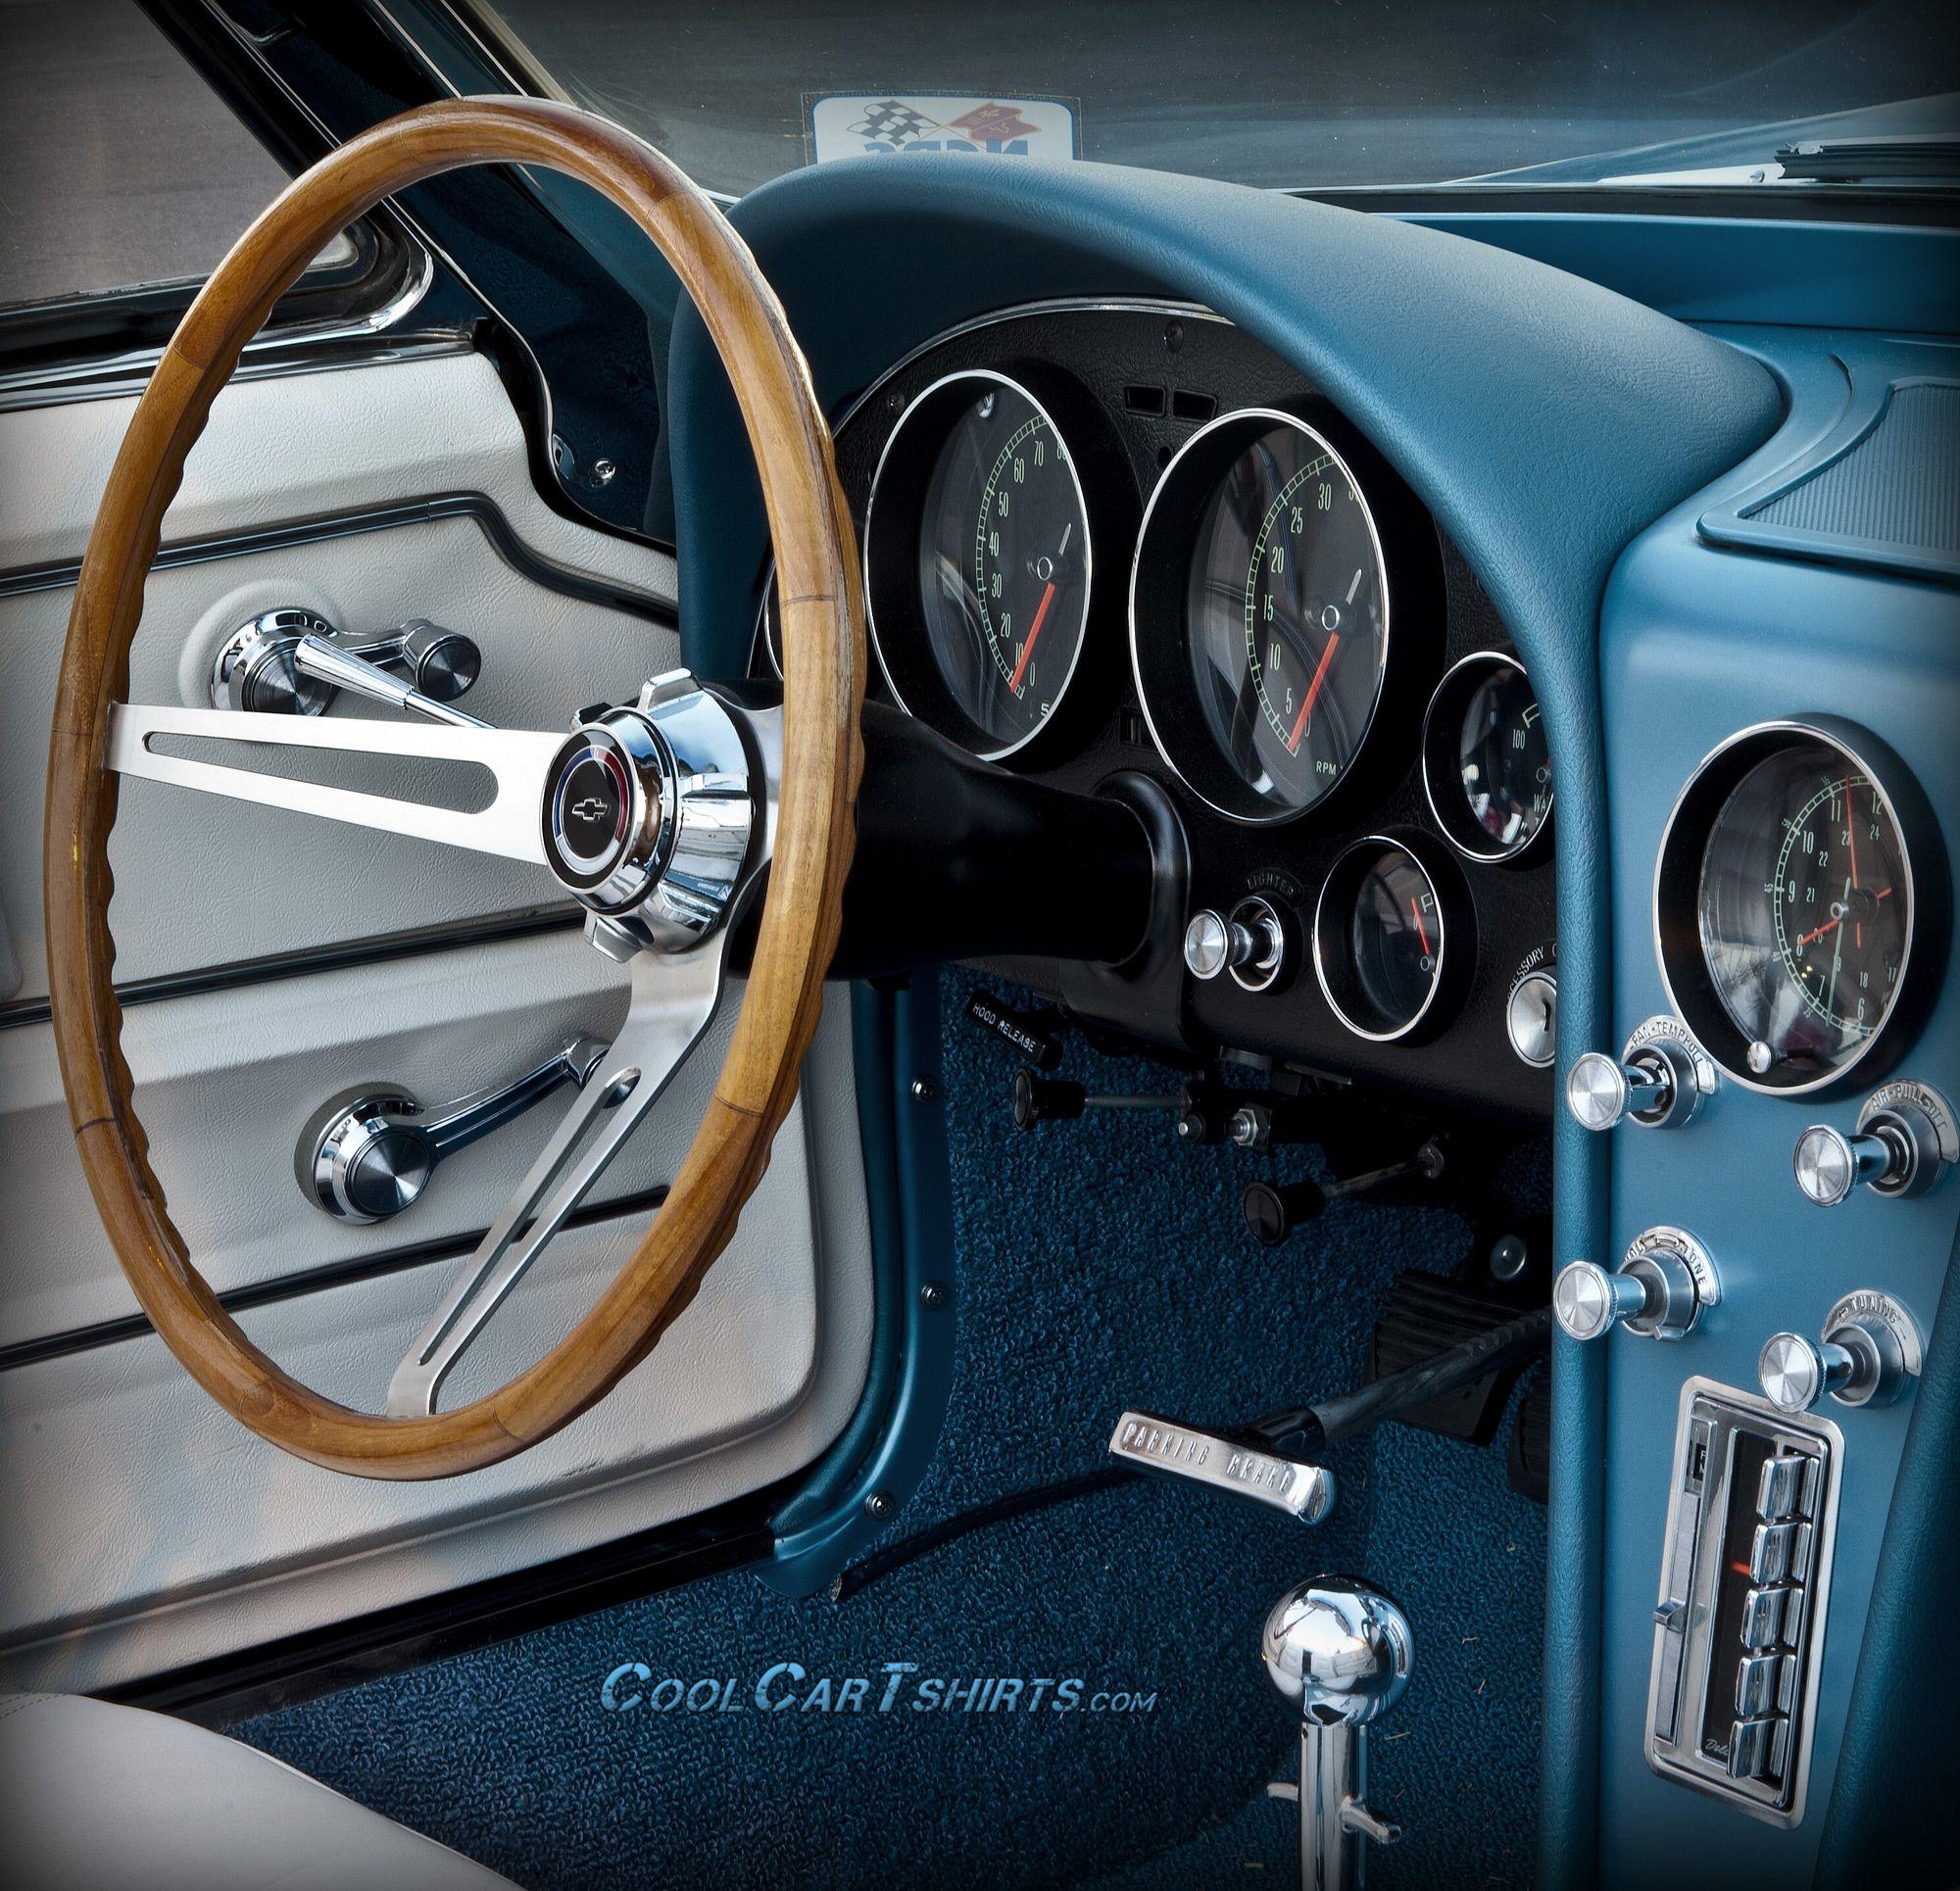 best corvette interior ever cars pinterest interiors cars and car interiors. Black Bedroom Furniture Sets. Home Design Ideas